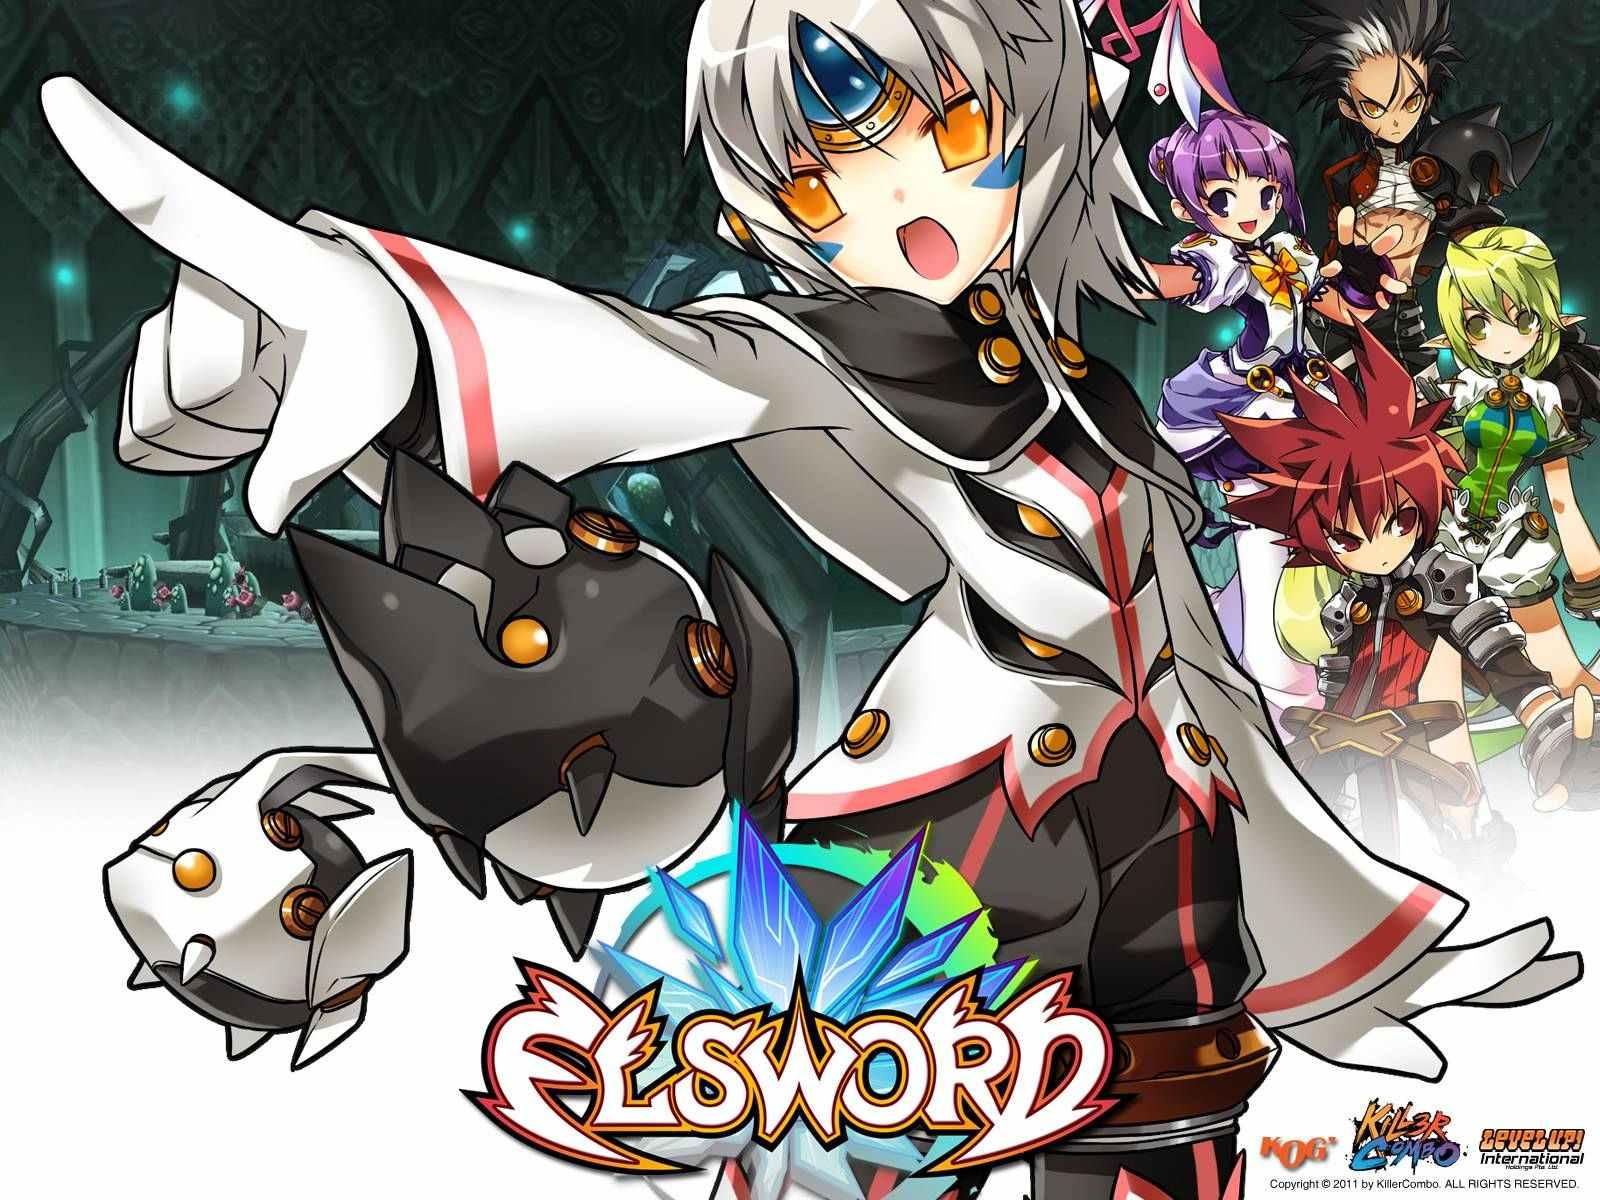 how to download elsword season 2